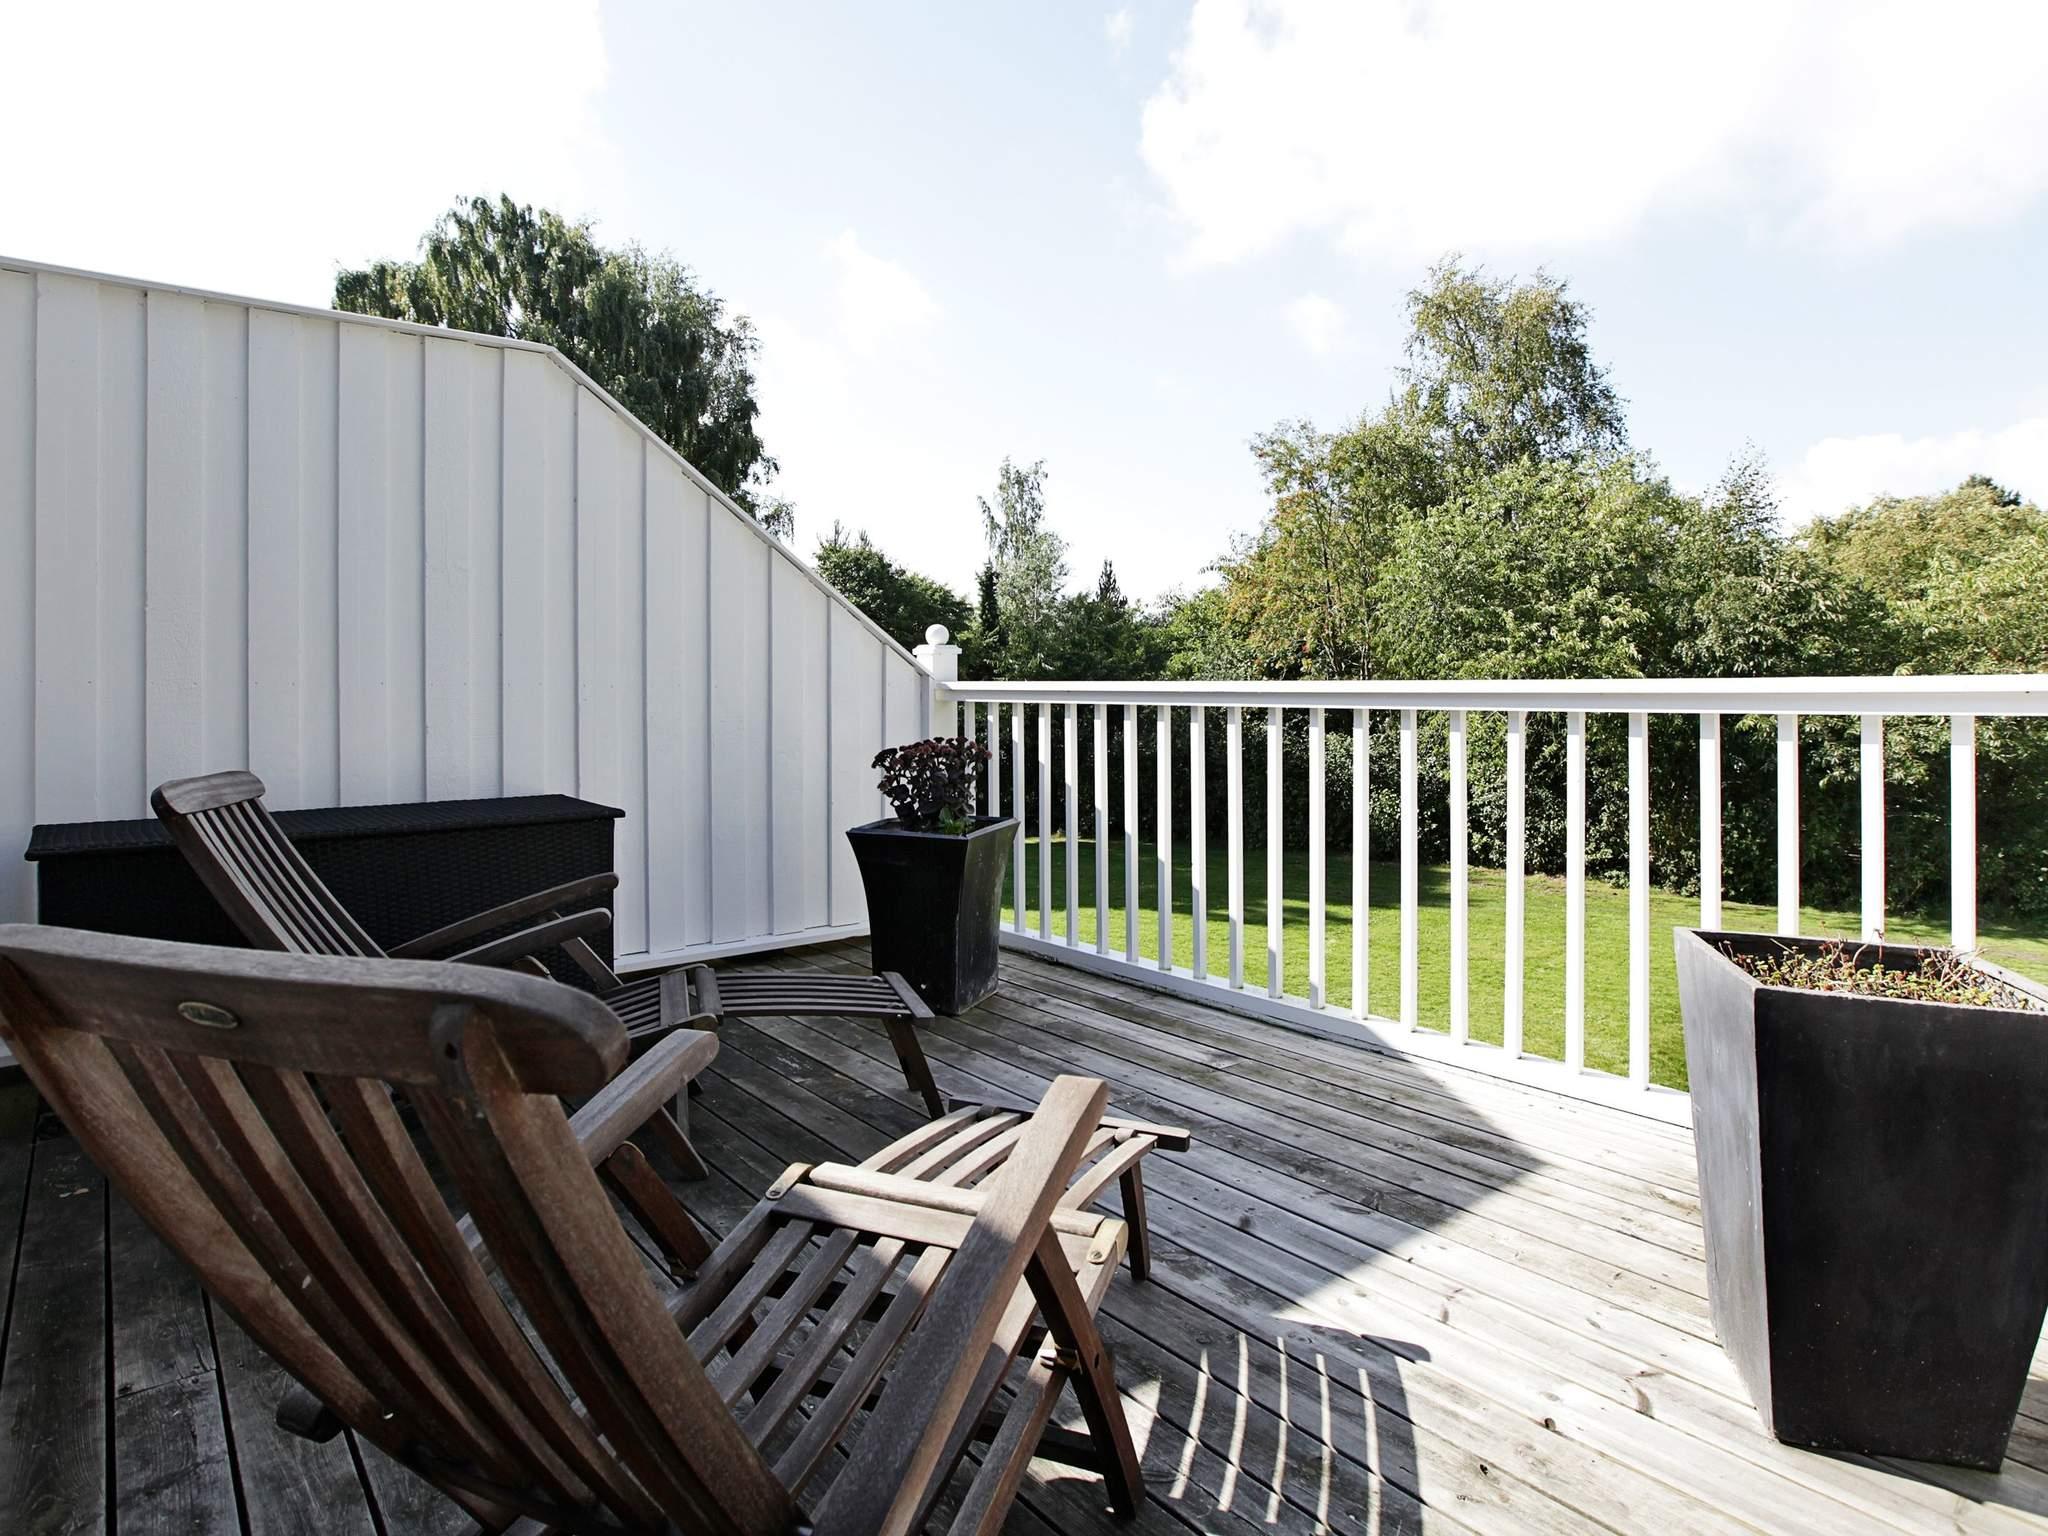 Ferienhaus Rørvig (226338), Nykøbing Sj, , Westseeland, Dänemark, Bild 21